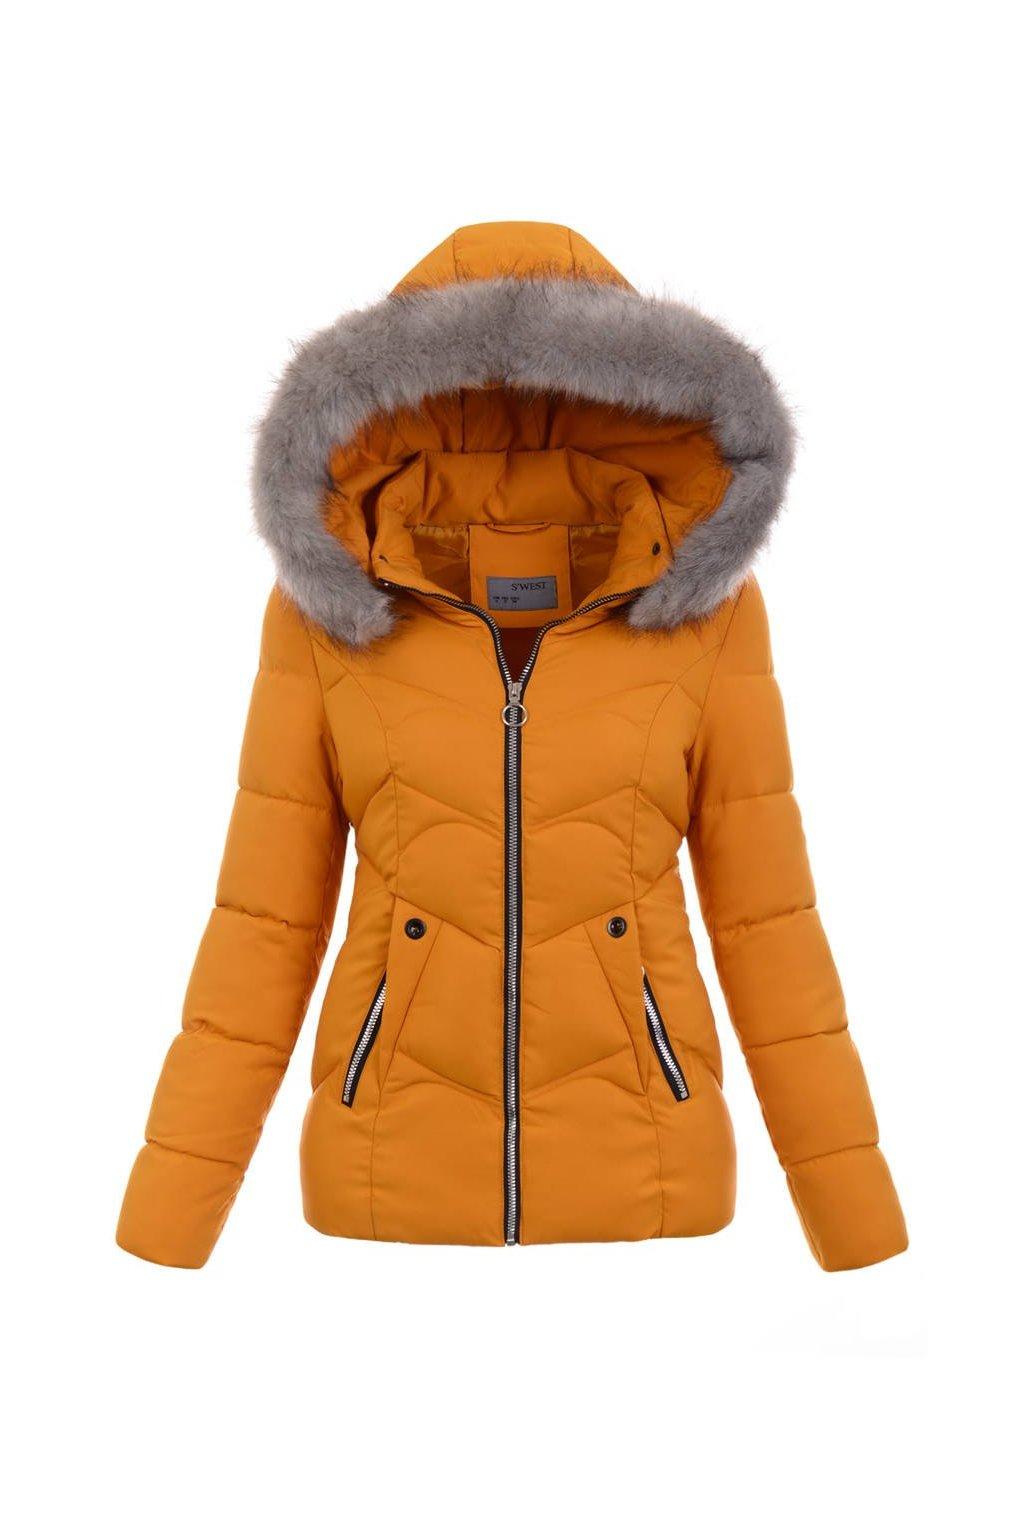 Dámska zimná bunda s kapucňou 5136 žltá